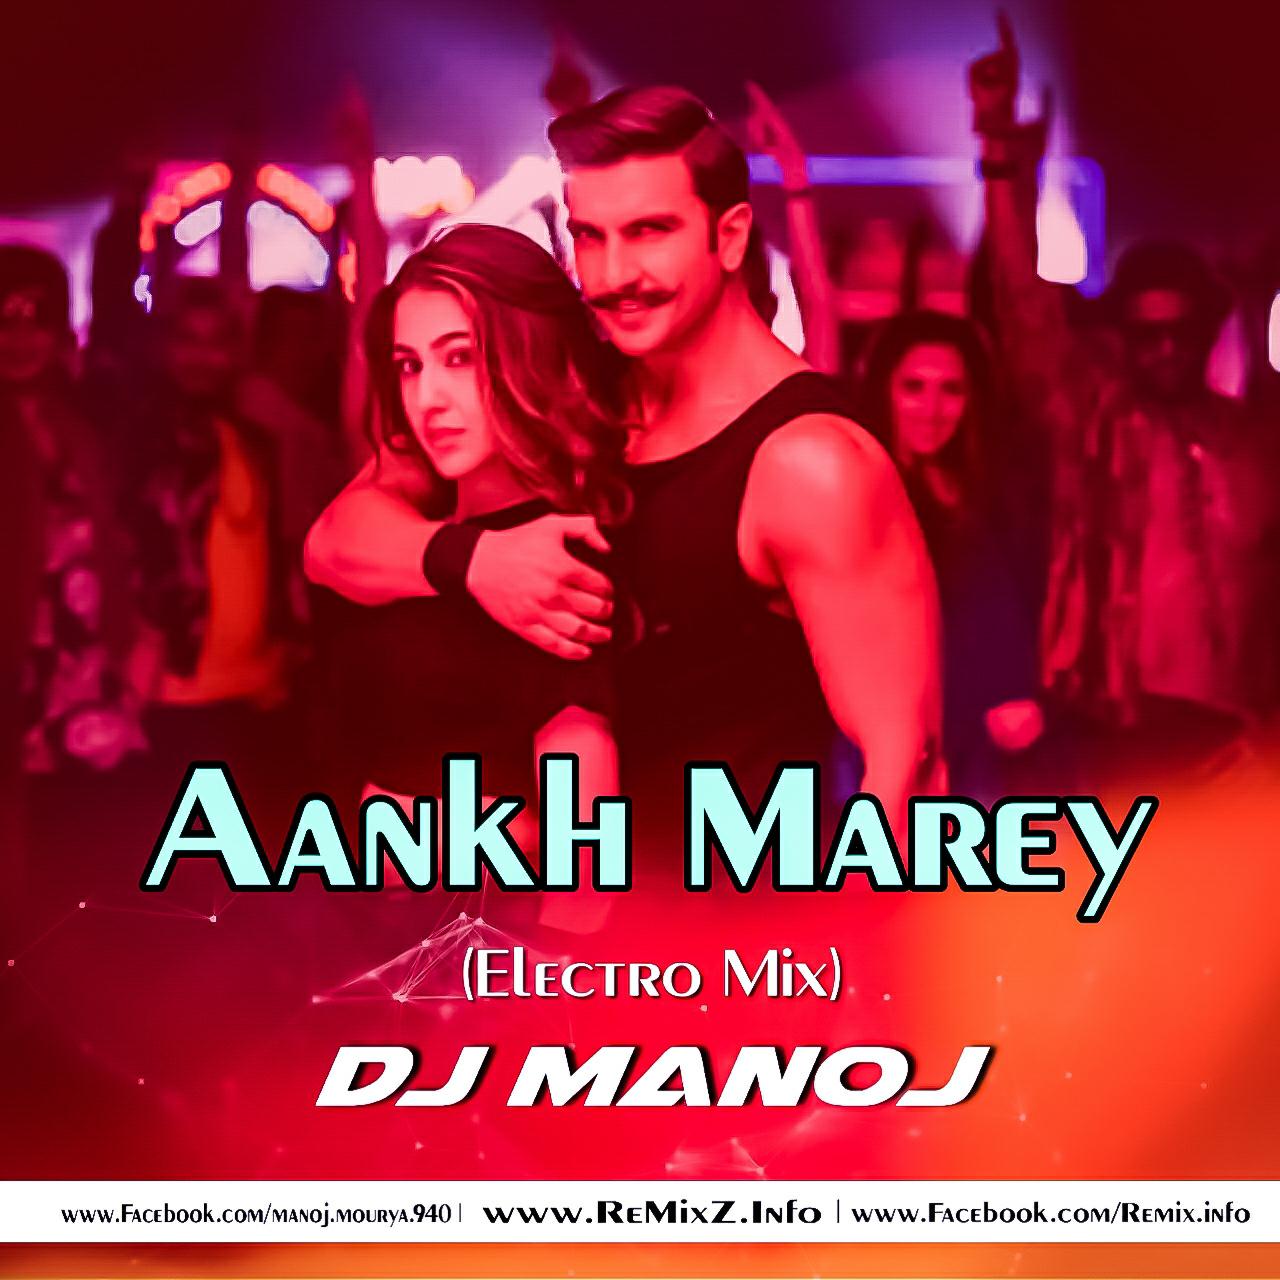 Aankh-Marey-Electro-Mix-DJ-Manoj.jpg